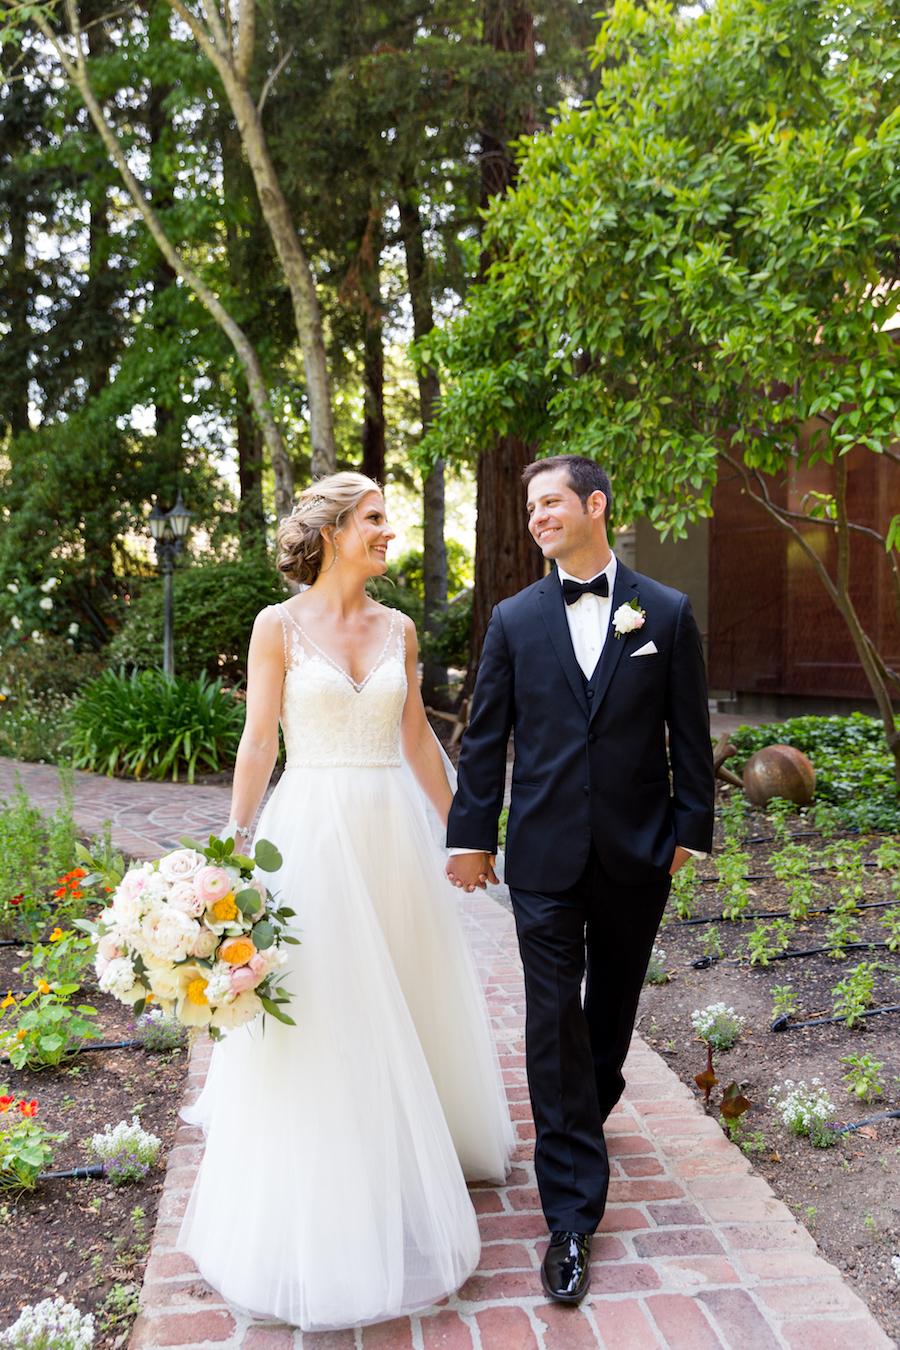 Chic and Organic Outdoor Wedding at Harvest Inn17.jpg